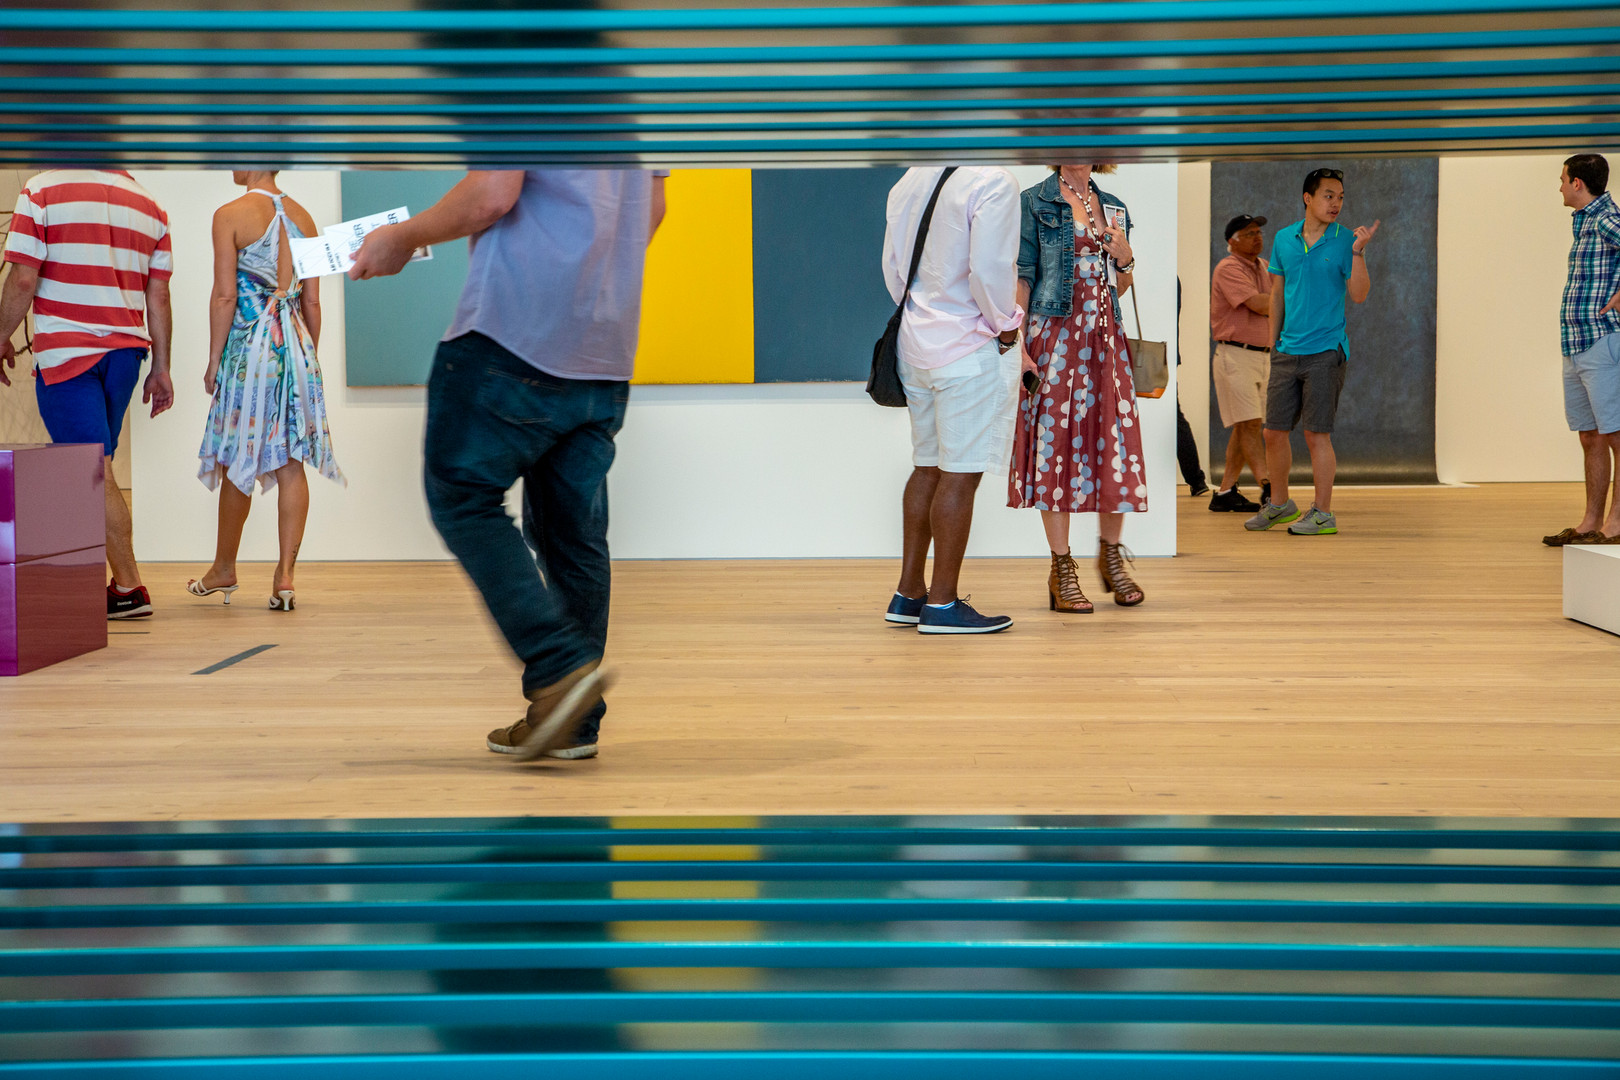 Whitney Museum of American Art, NYC